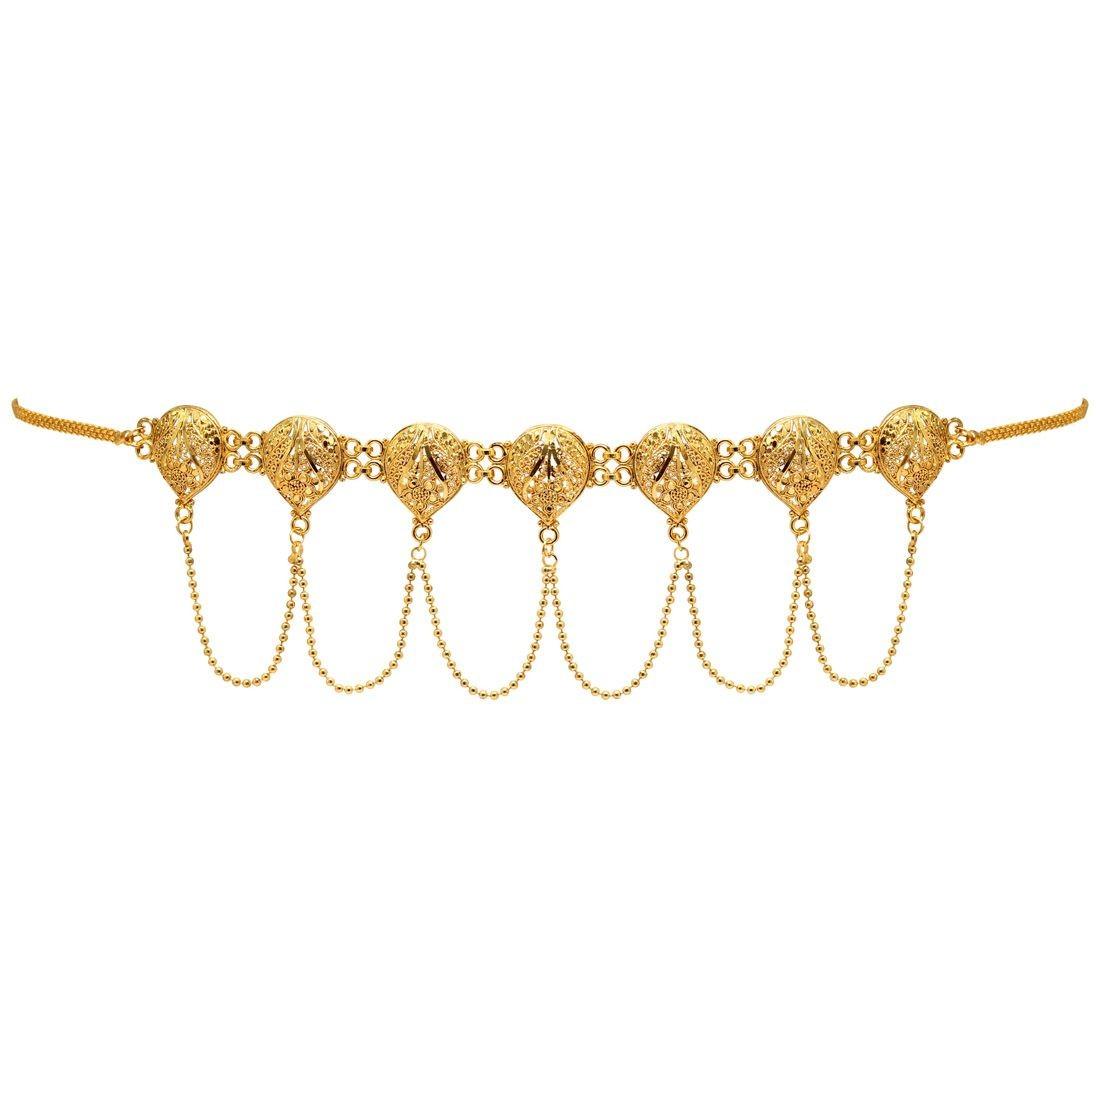 Cinturon dorado tallado con cadenas